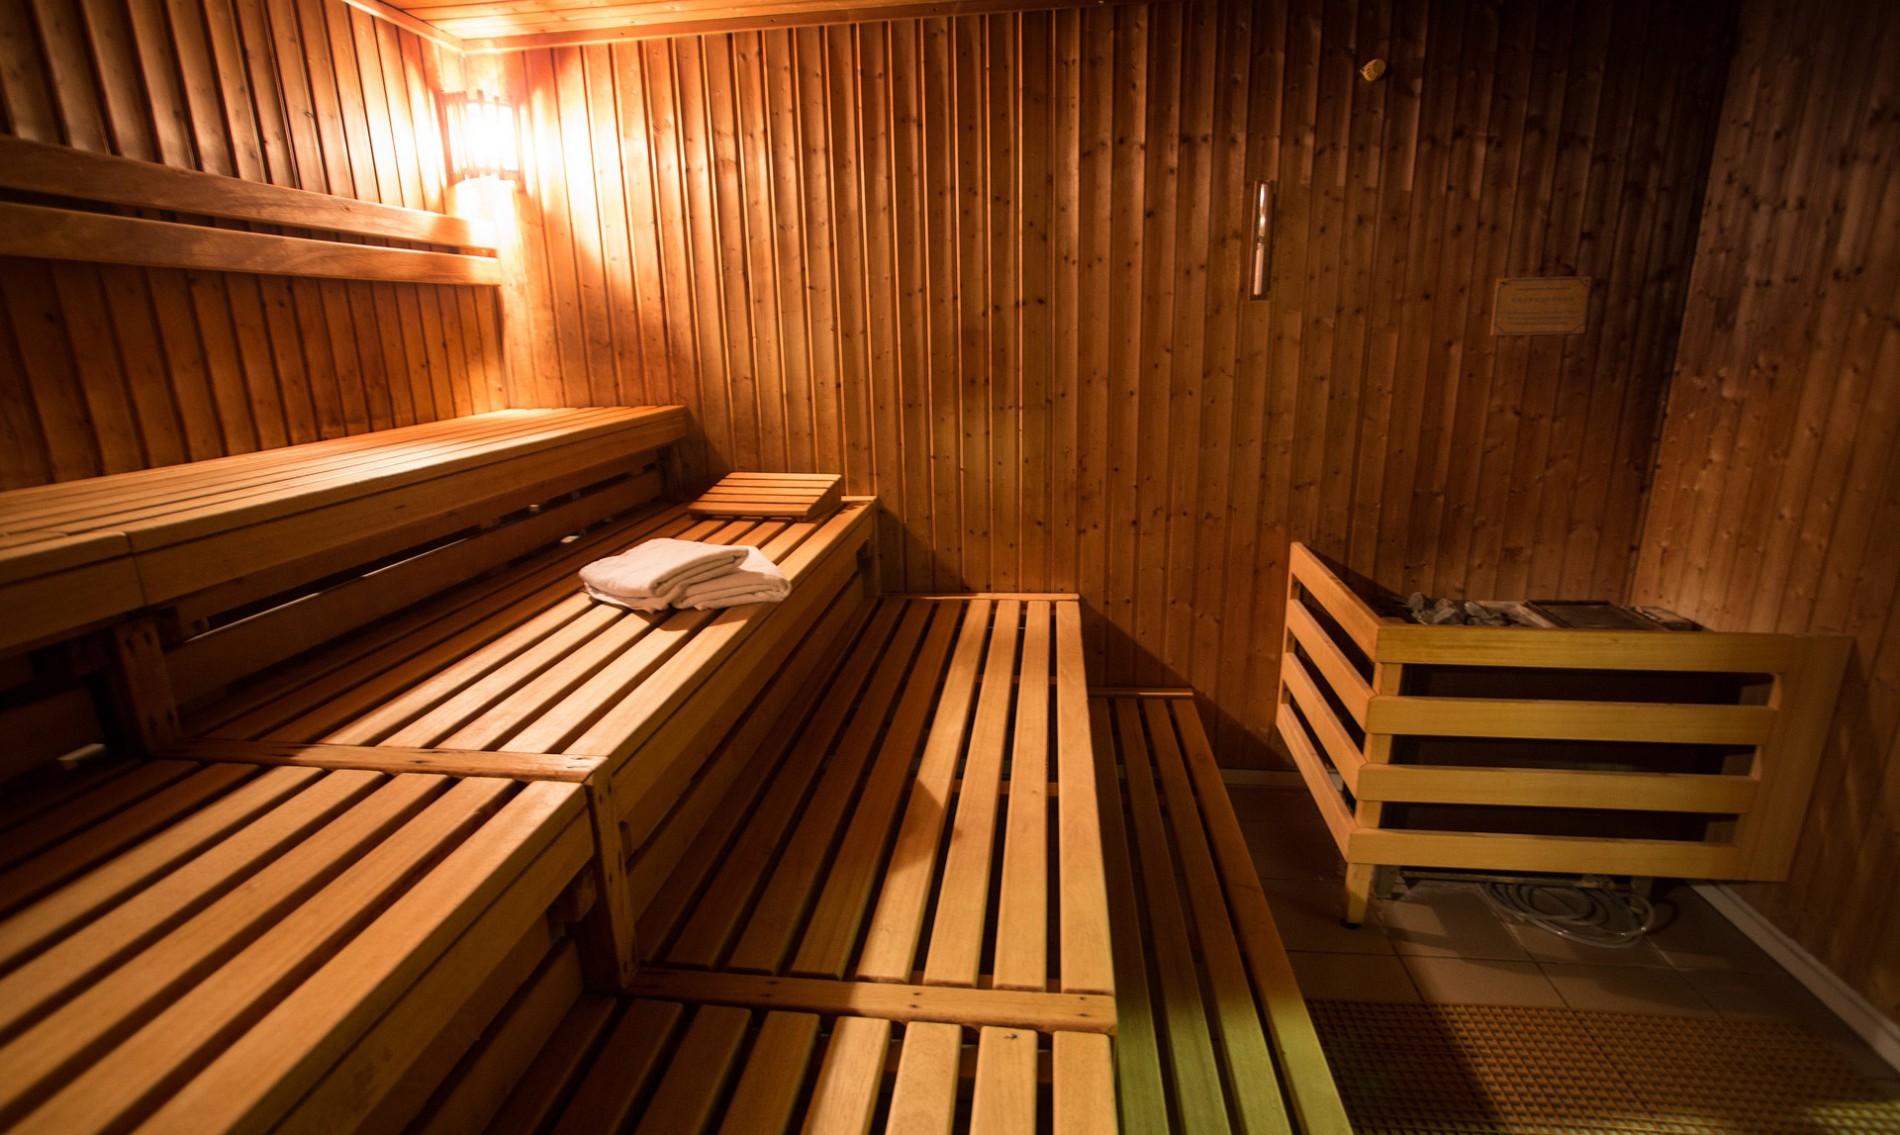 Sauna5thermen - Finse sauna